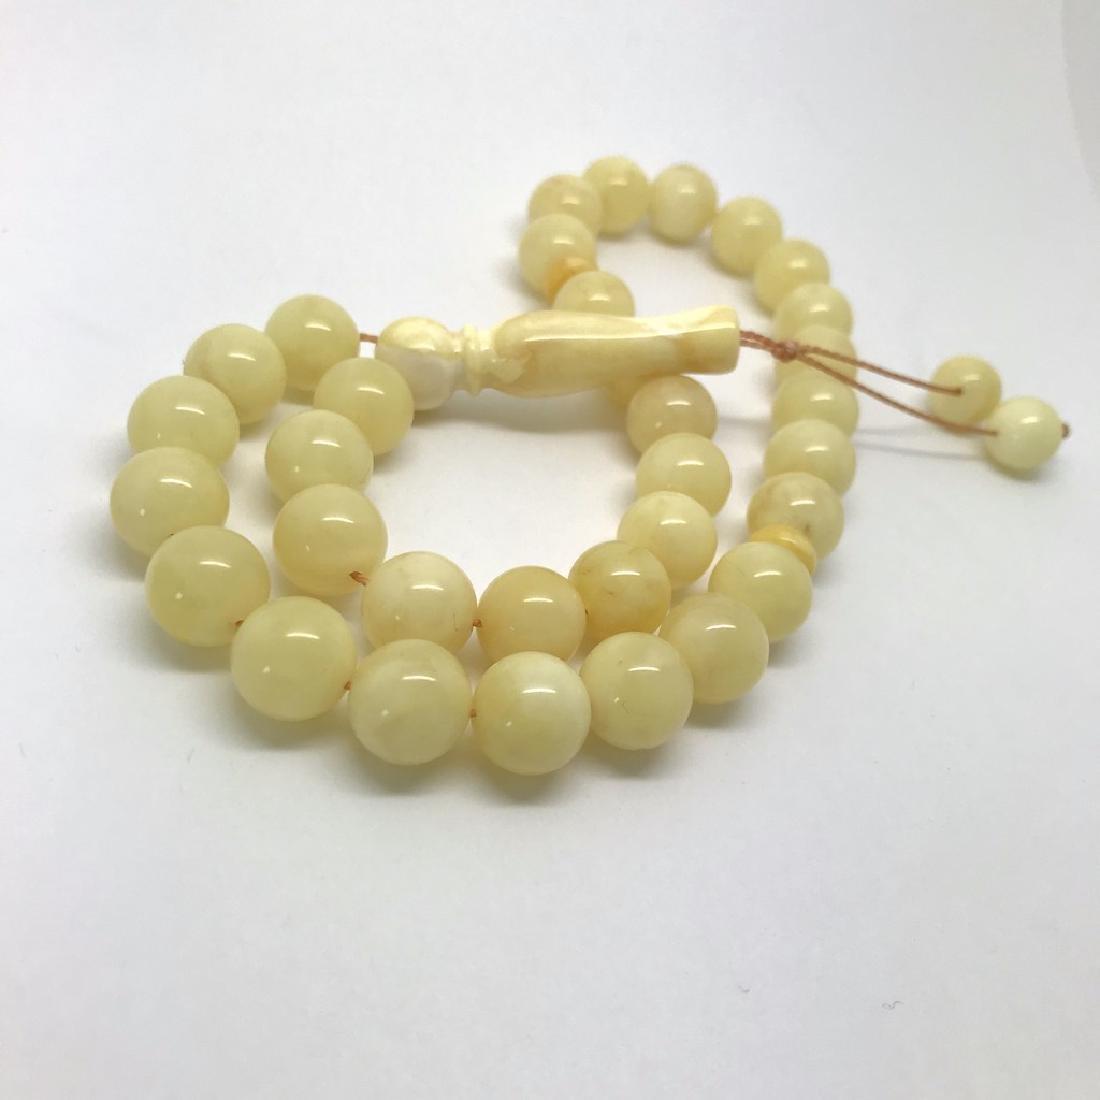 Misbaha tesbih Baltic amber white 33 beads ø10mm 22.7 - 3